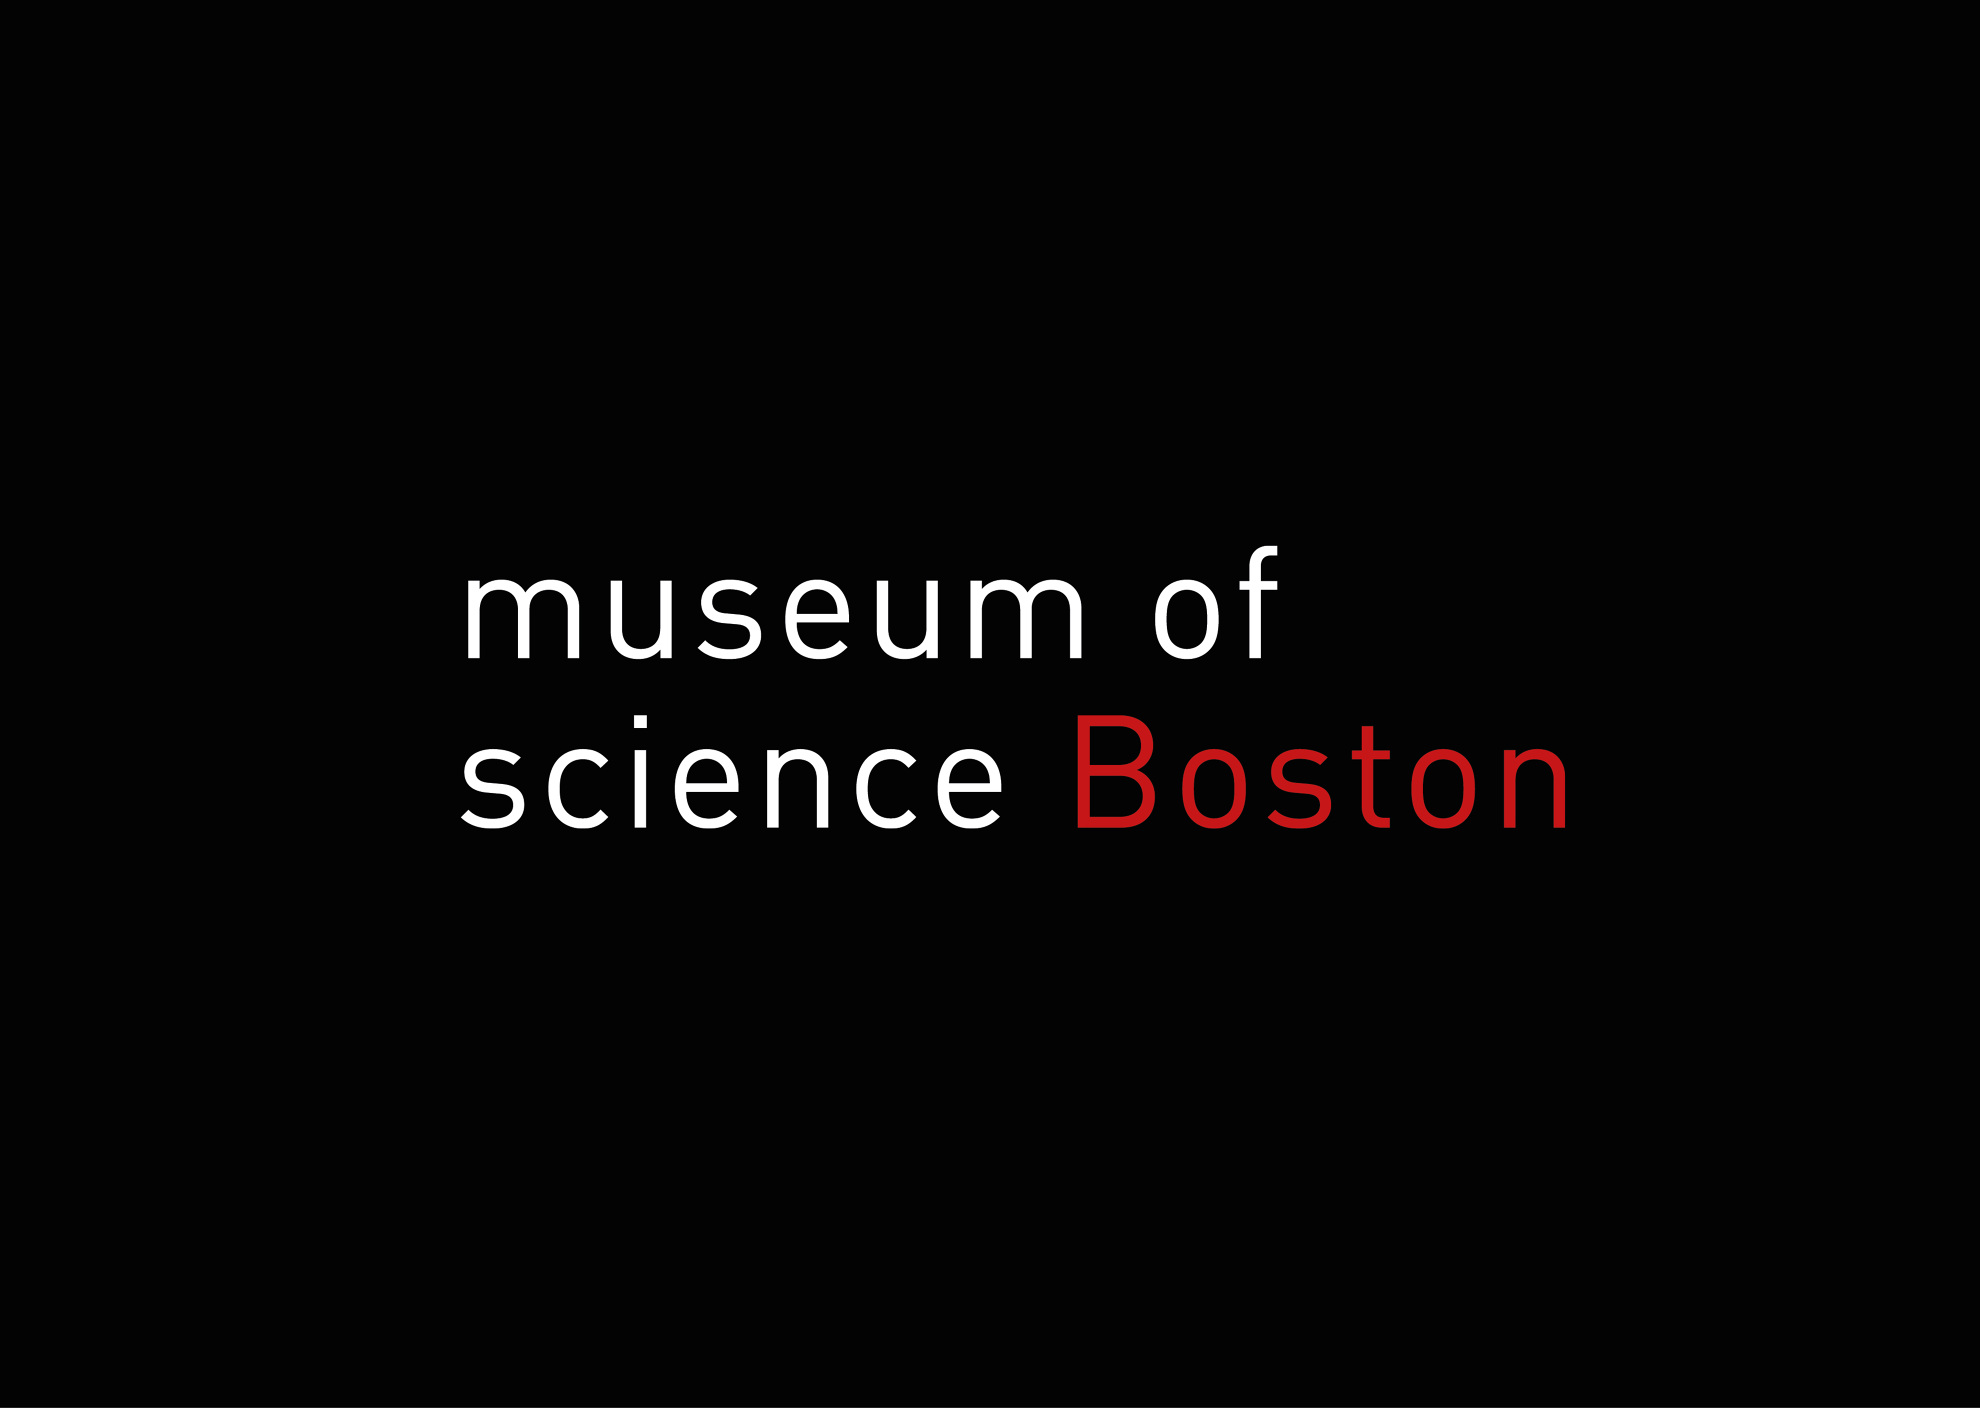 VOLUNTEER AT THE MUSEUM OF SCIENCE